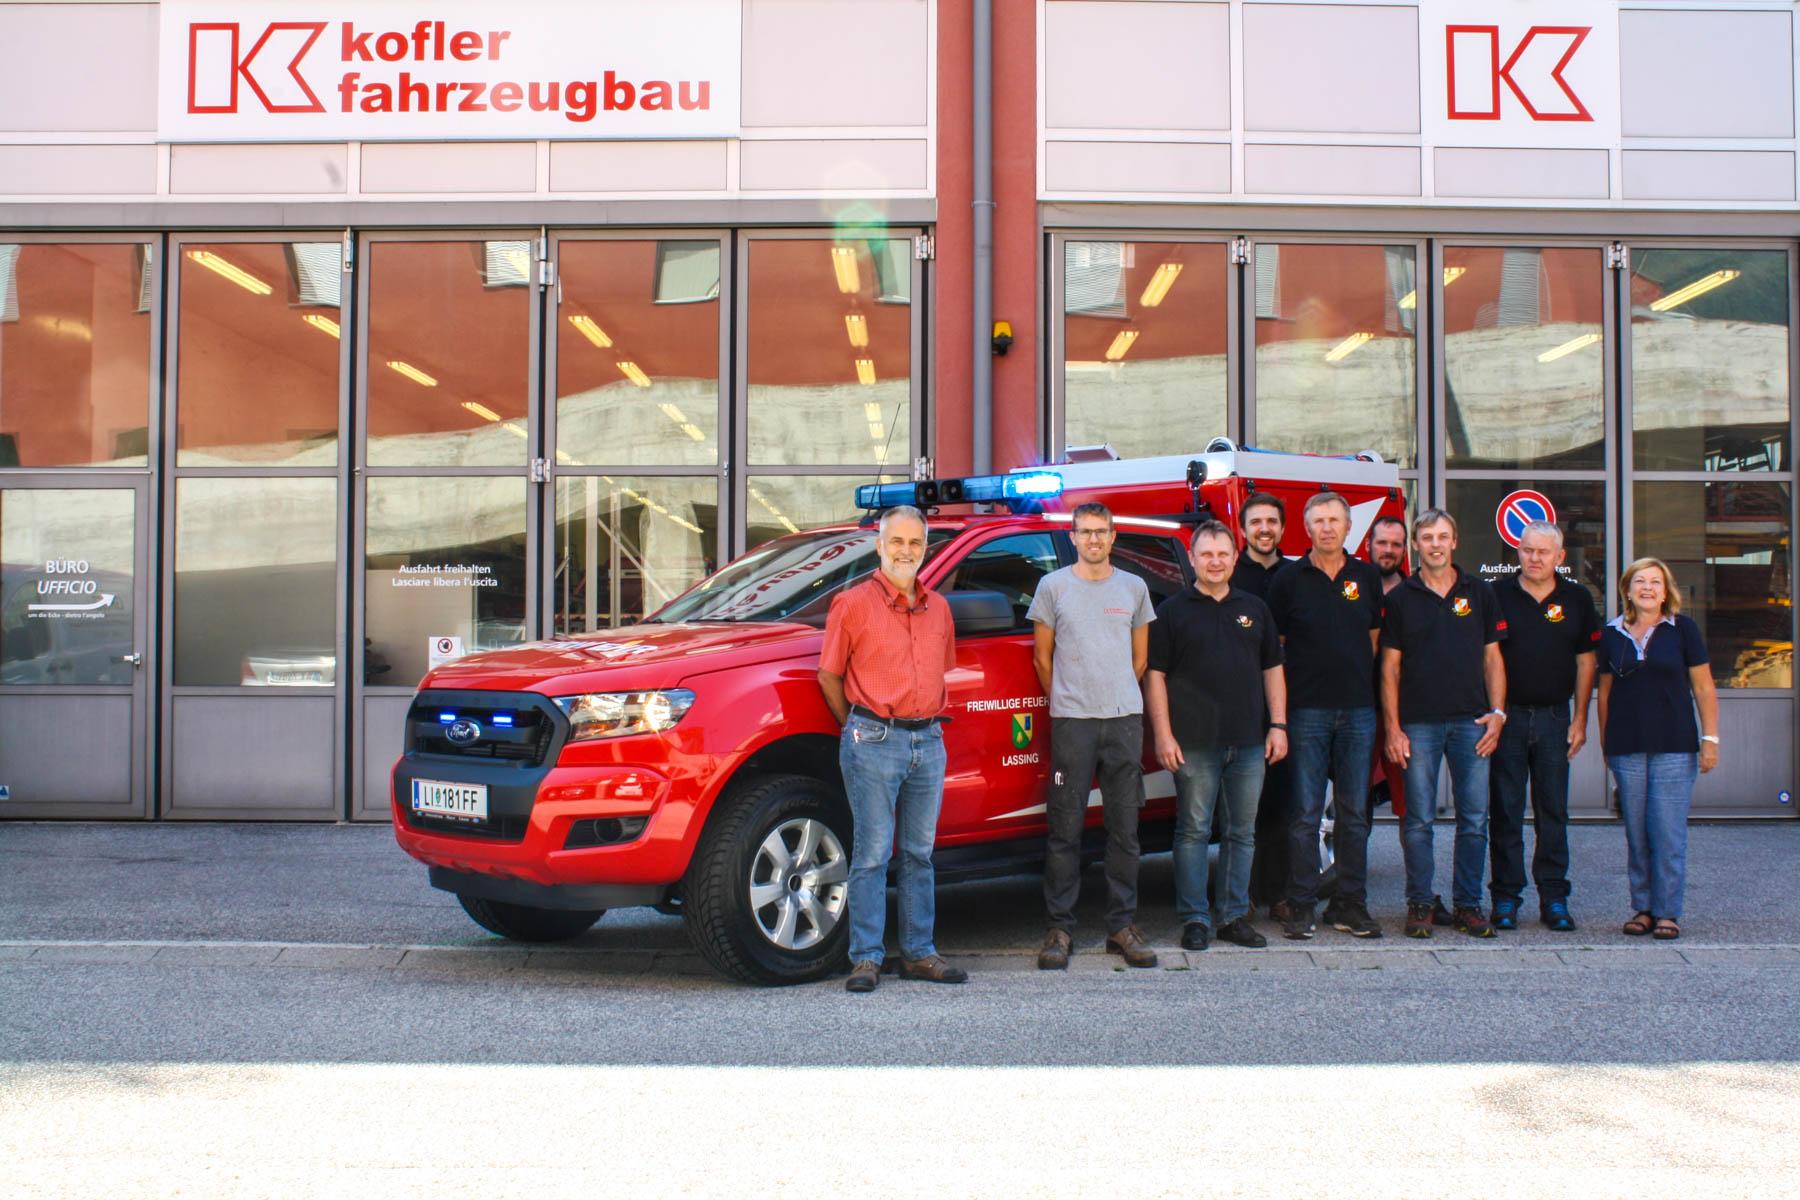 Kofler-Fahrzeugbau-FF-Lassing